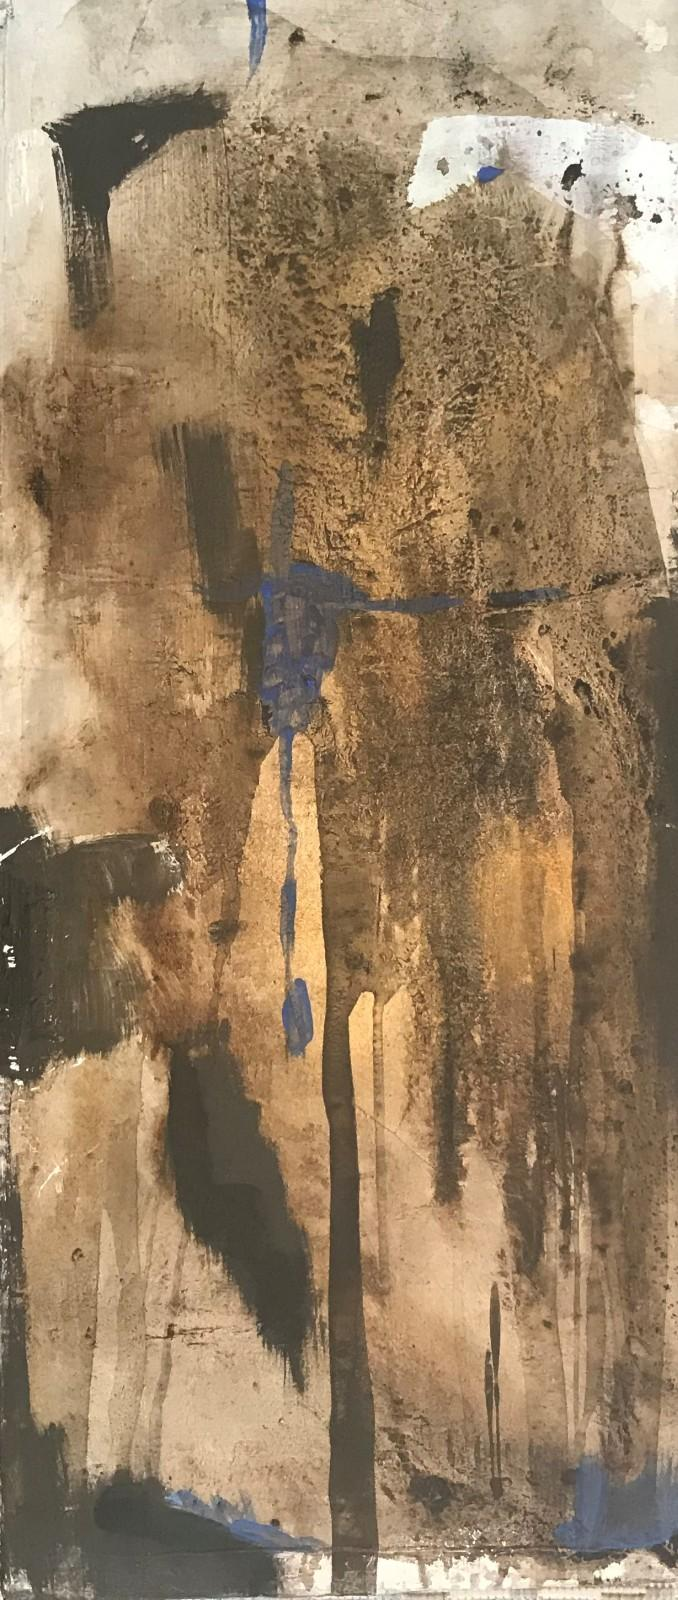 'Blauer Funke', Acryl-Mischtechnik, 80 cm h x 30 cm b x 2 cm t,